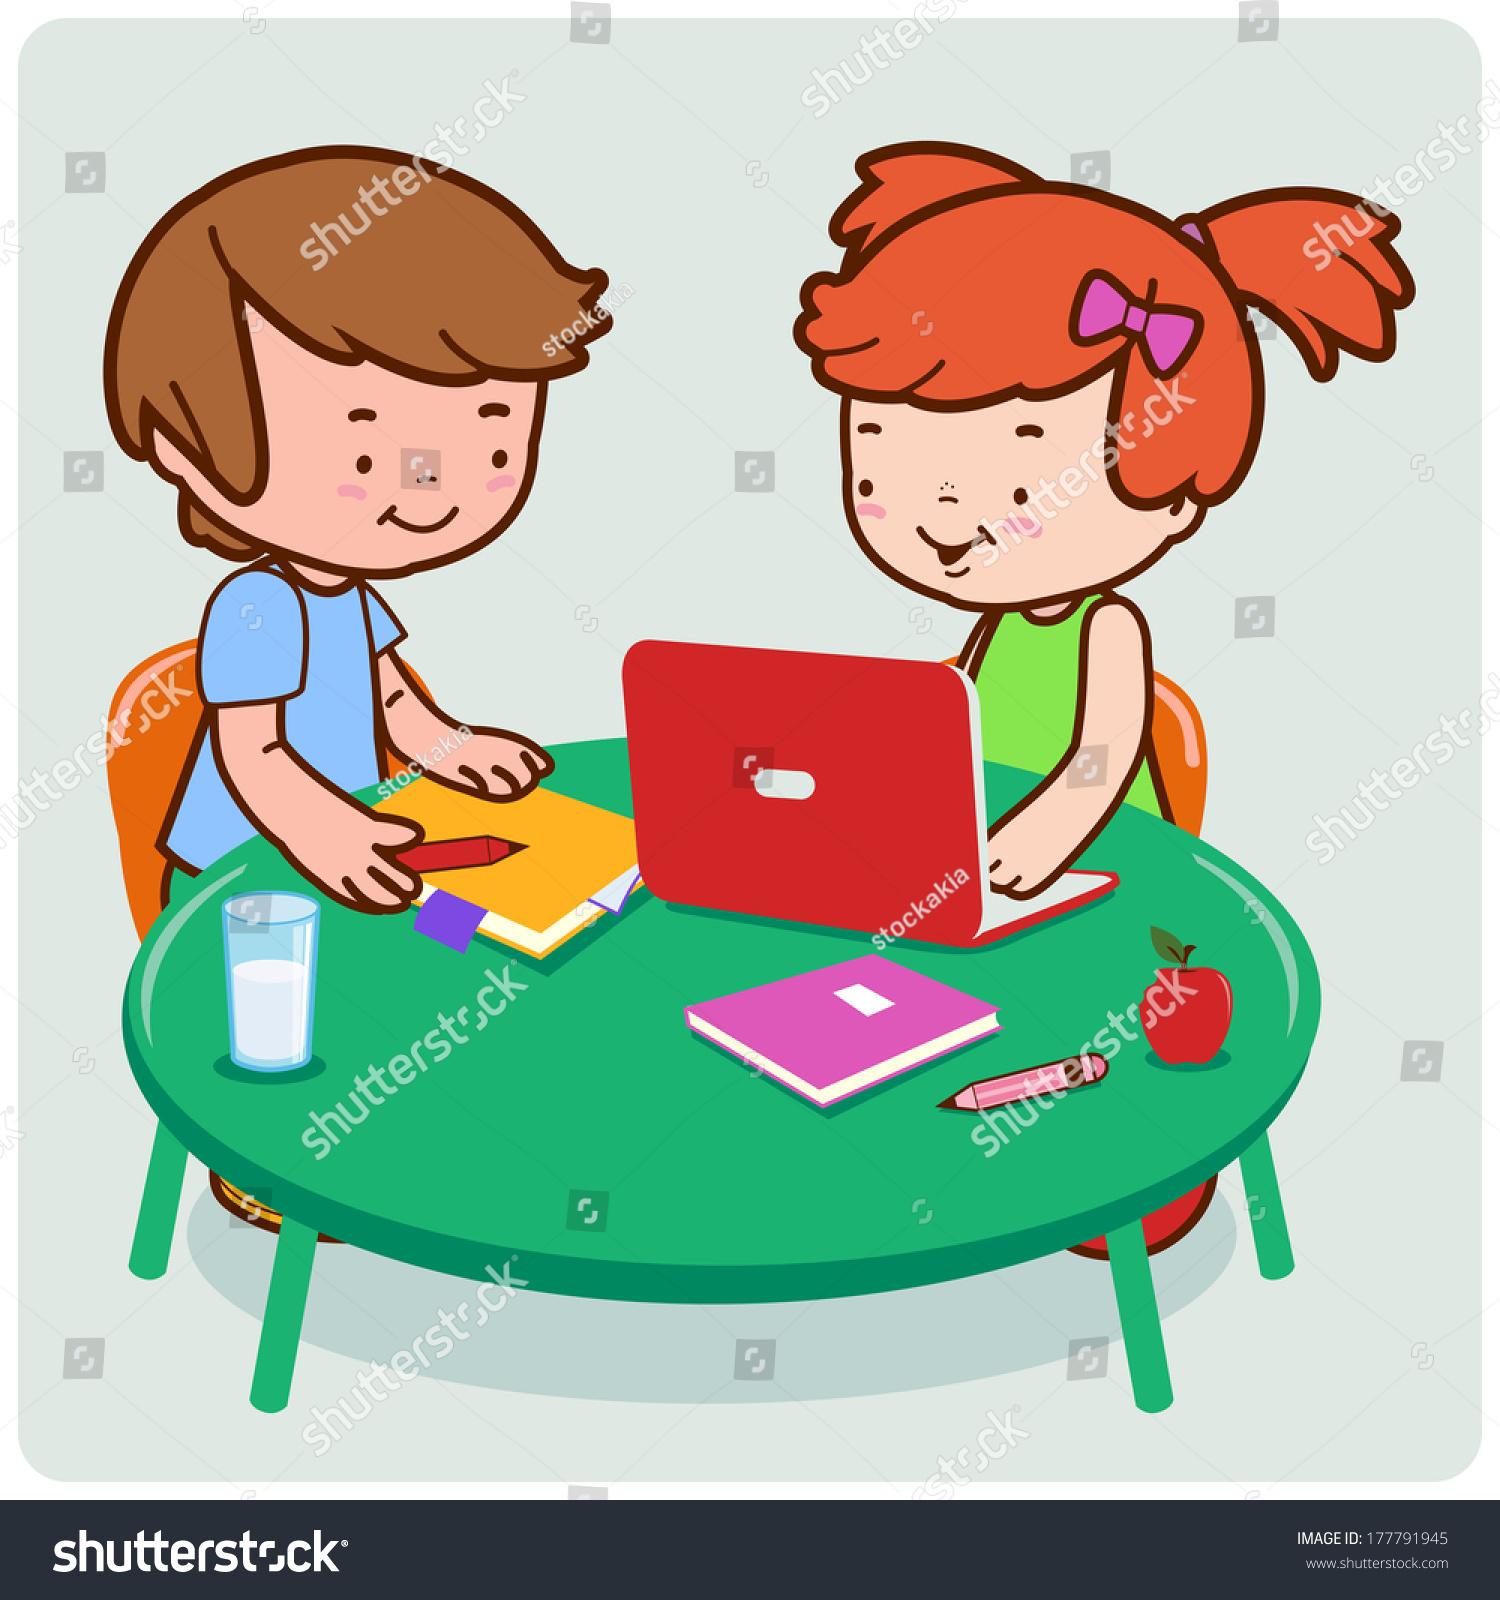 cartoon person doing homework